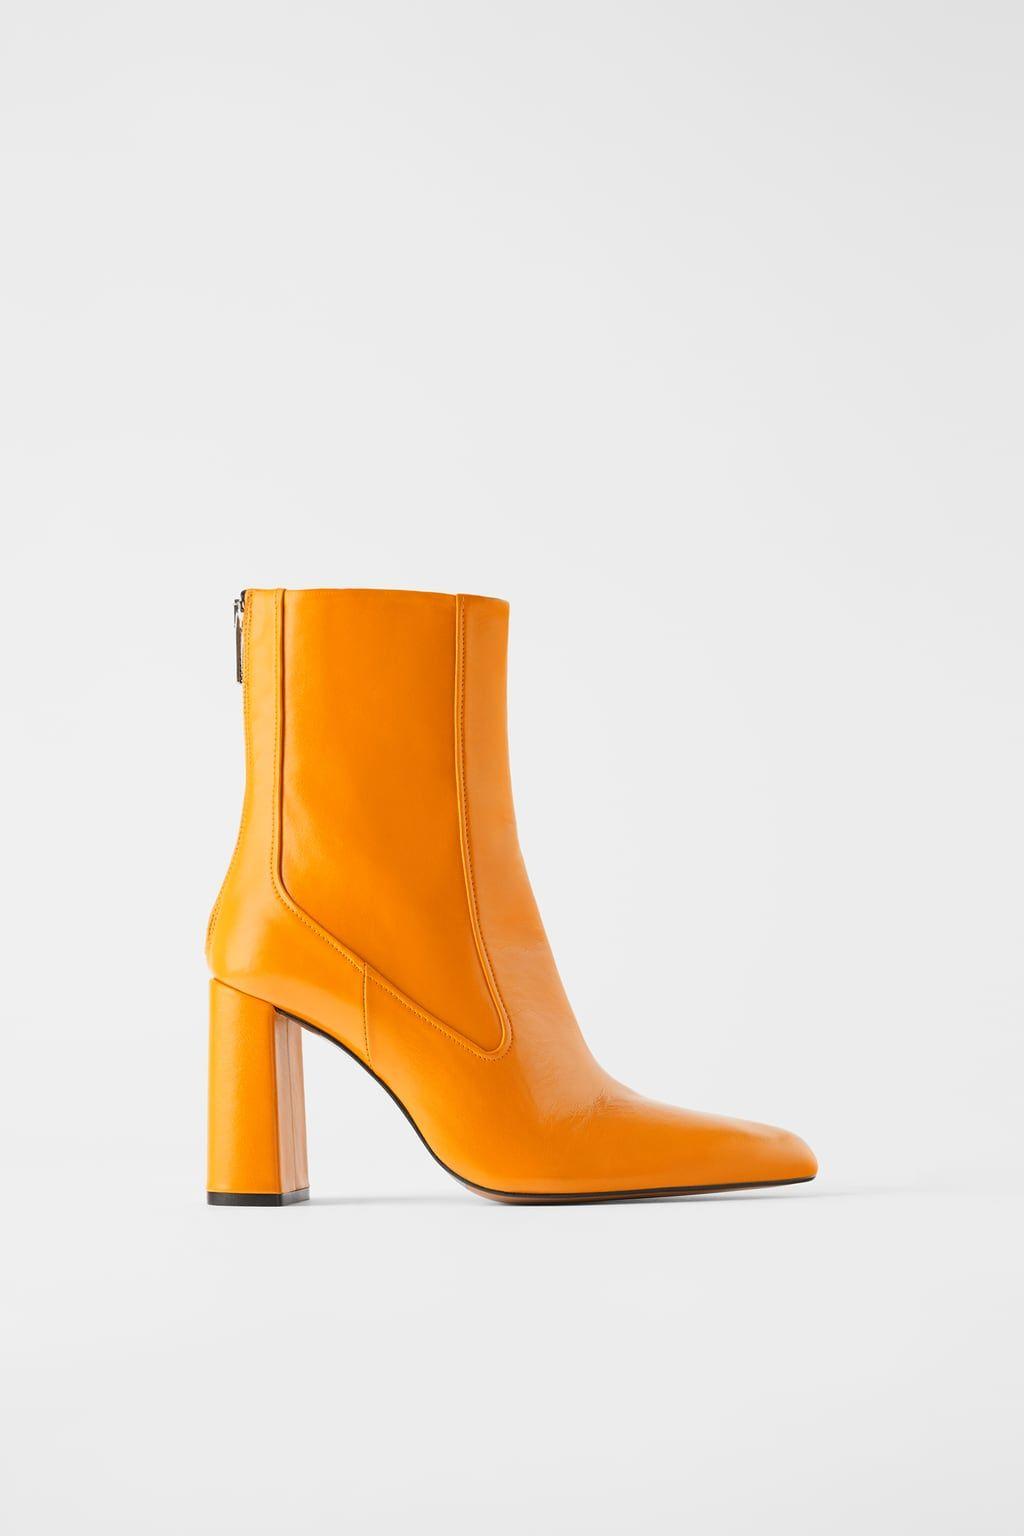 ZaraAccording Zara Editor Best Fashion At Boots9 Boots A To ukwOPZiXlT